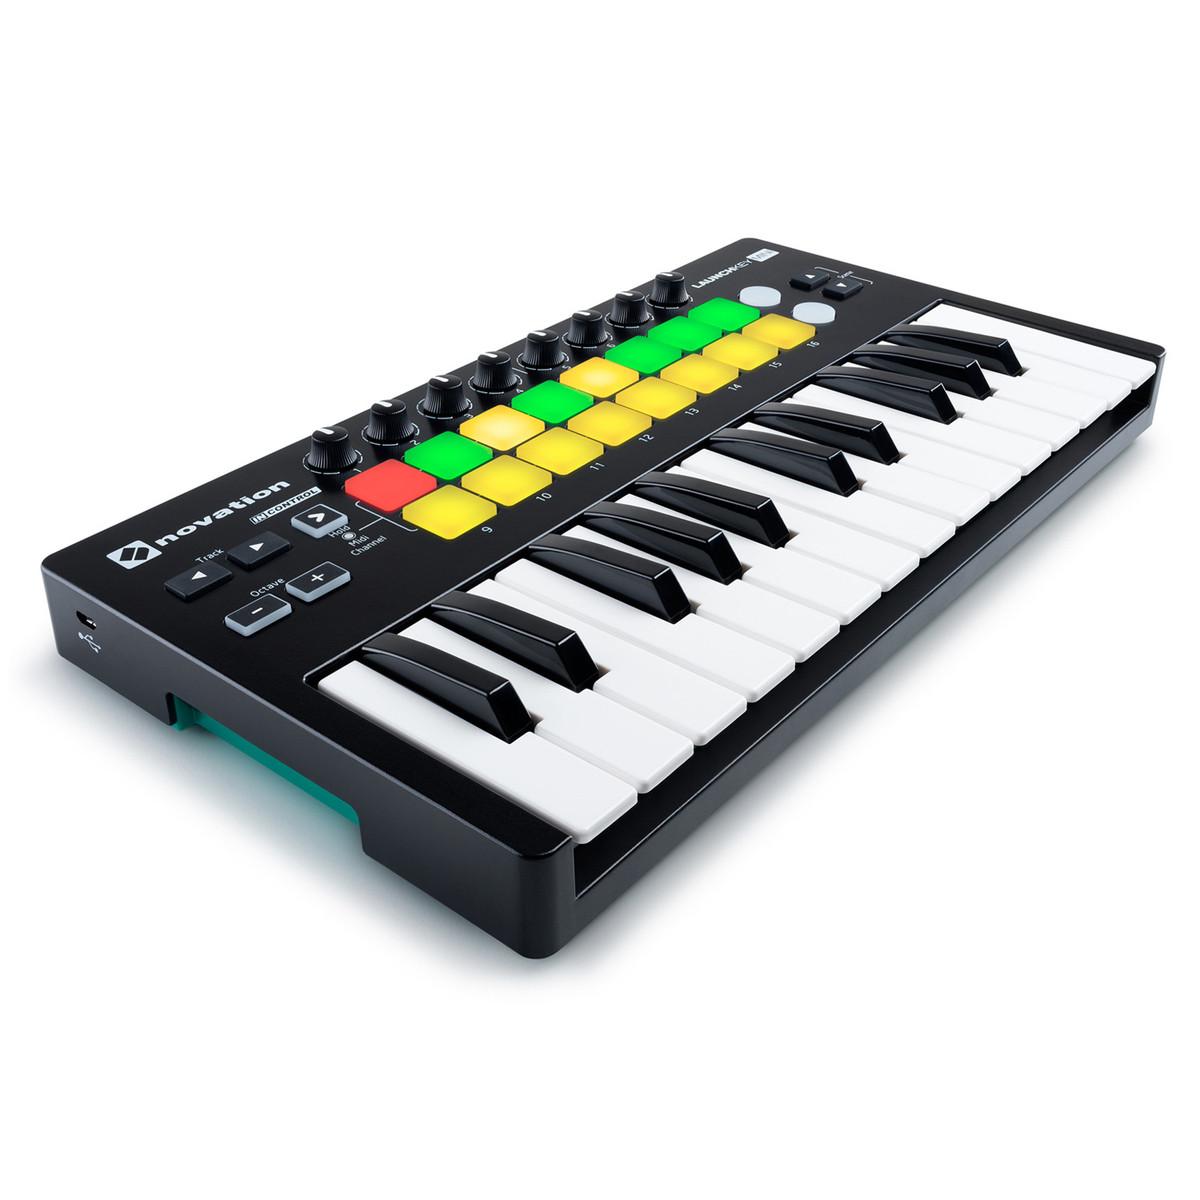 novation launchkey mini mk2 midi controller keyboard at. Black Bedroom Furniture Sets. Home Design Ideas